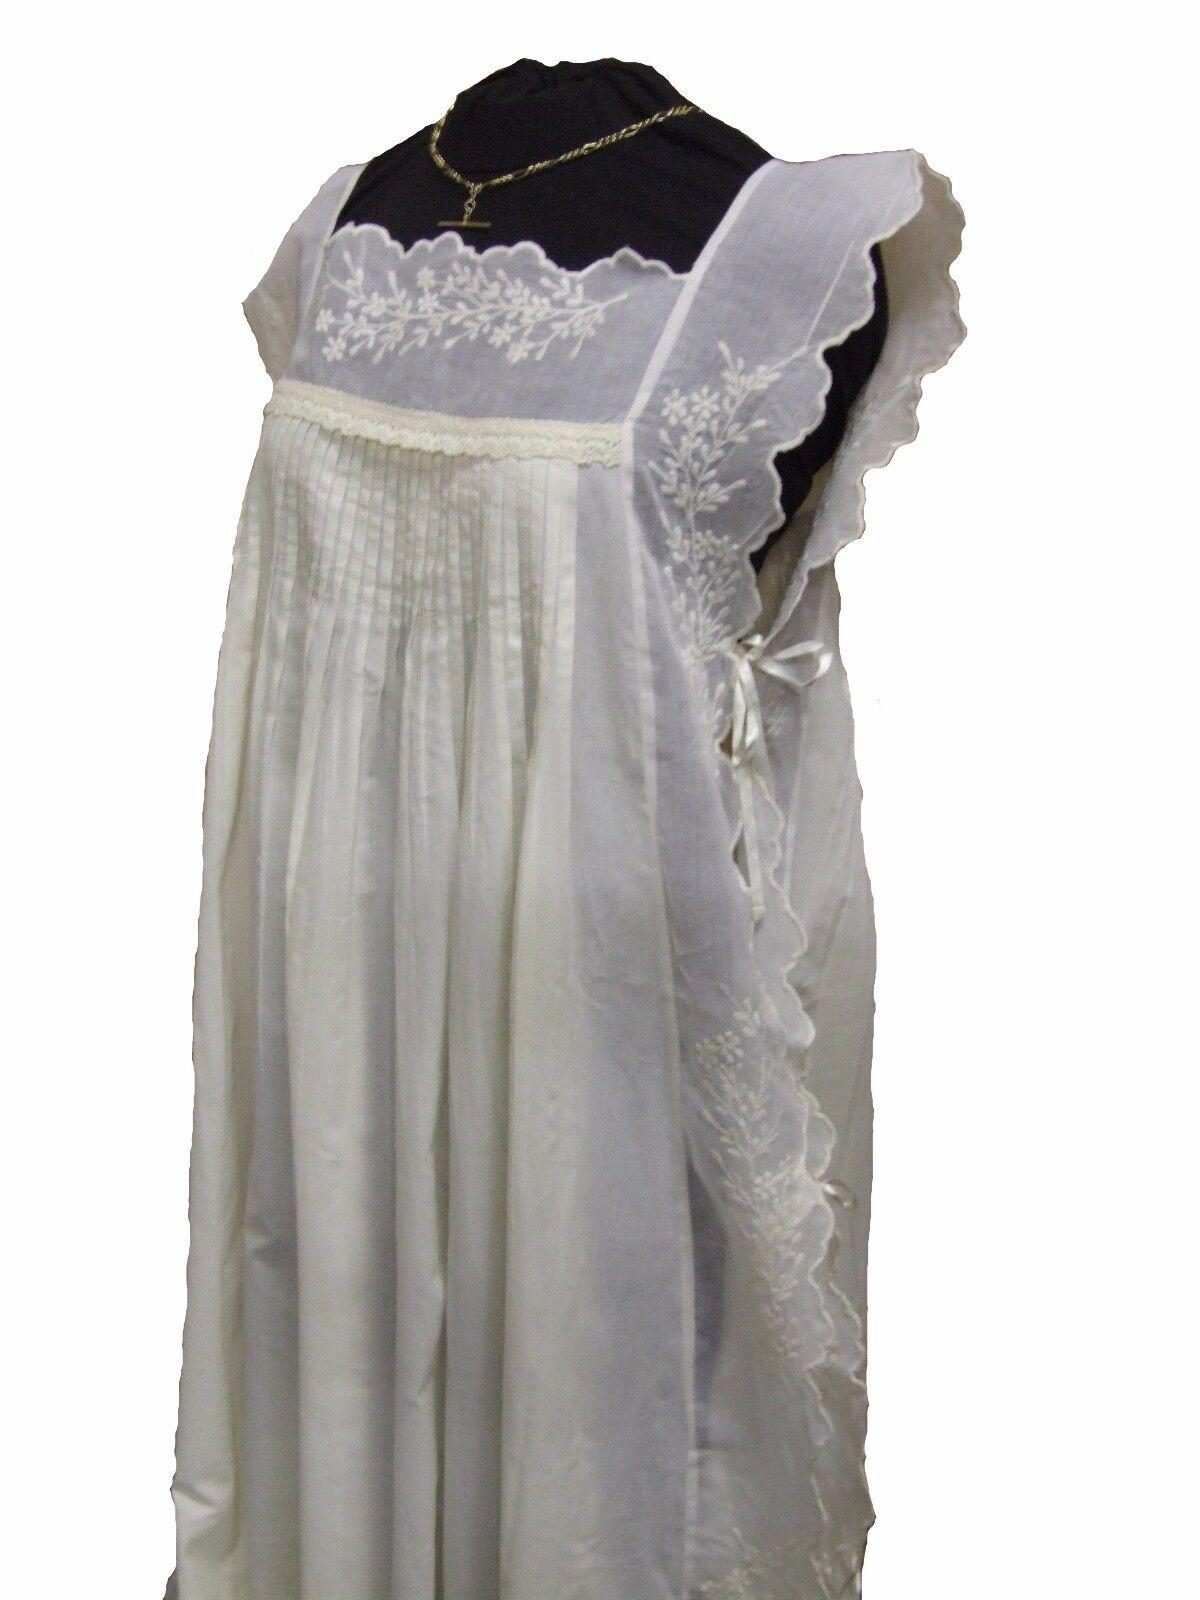 The Original Lace Co. England, Josephine Nightdress, Night Wear, Ivory,Menopause